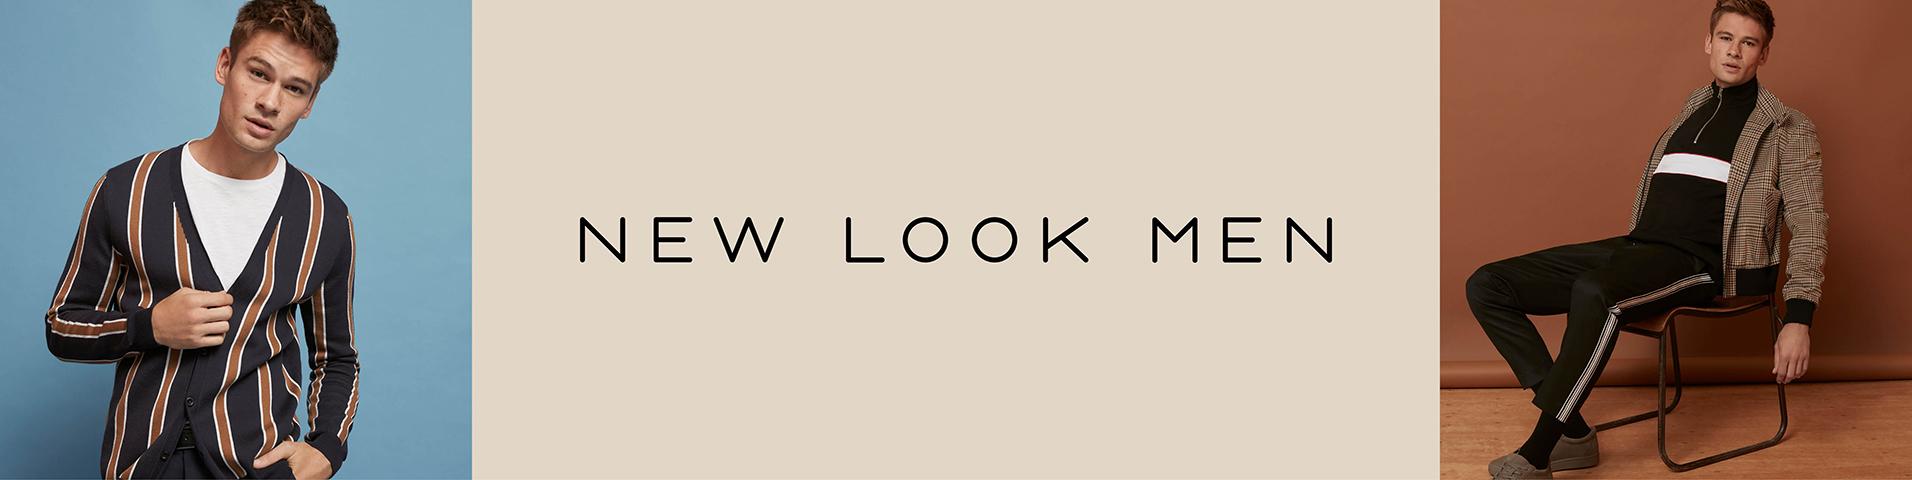 New Look Mode   Schuhe für Herren online shoppen   Zalando f140623a3c